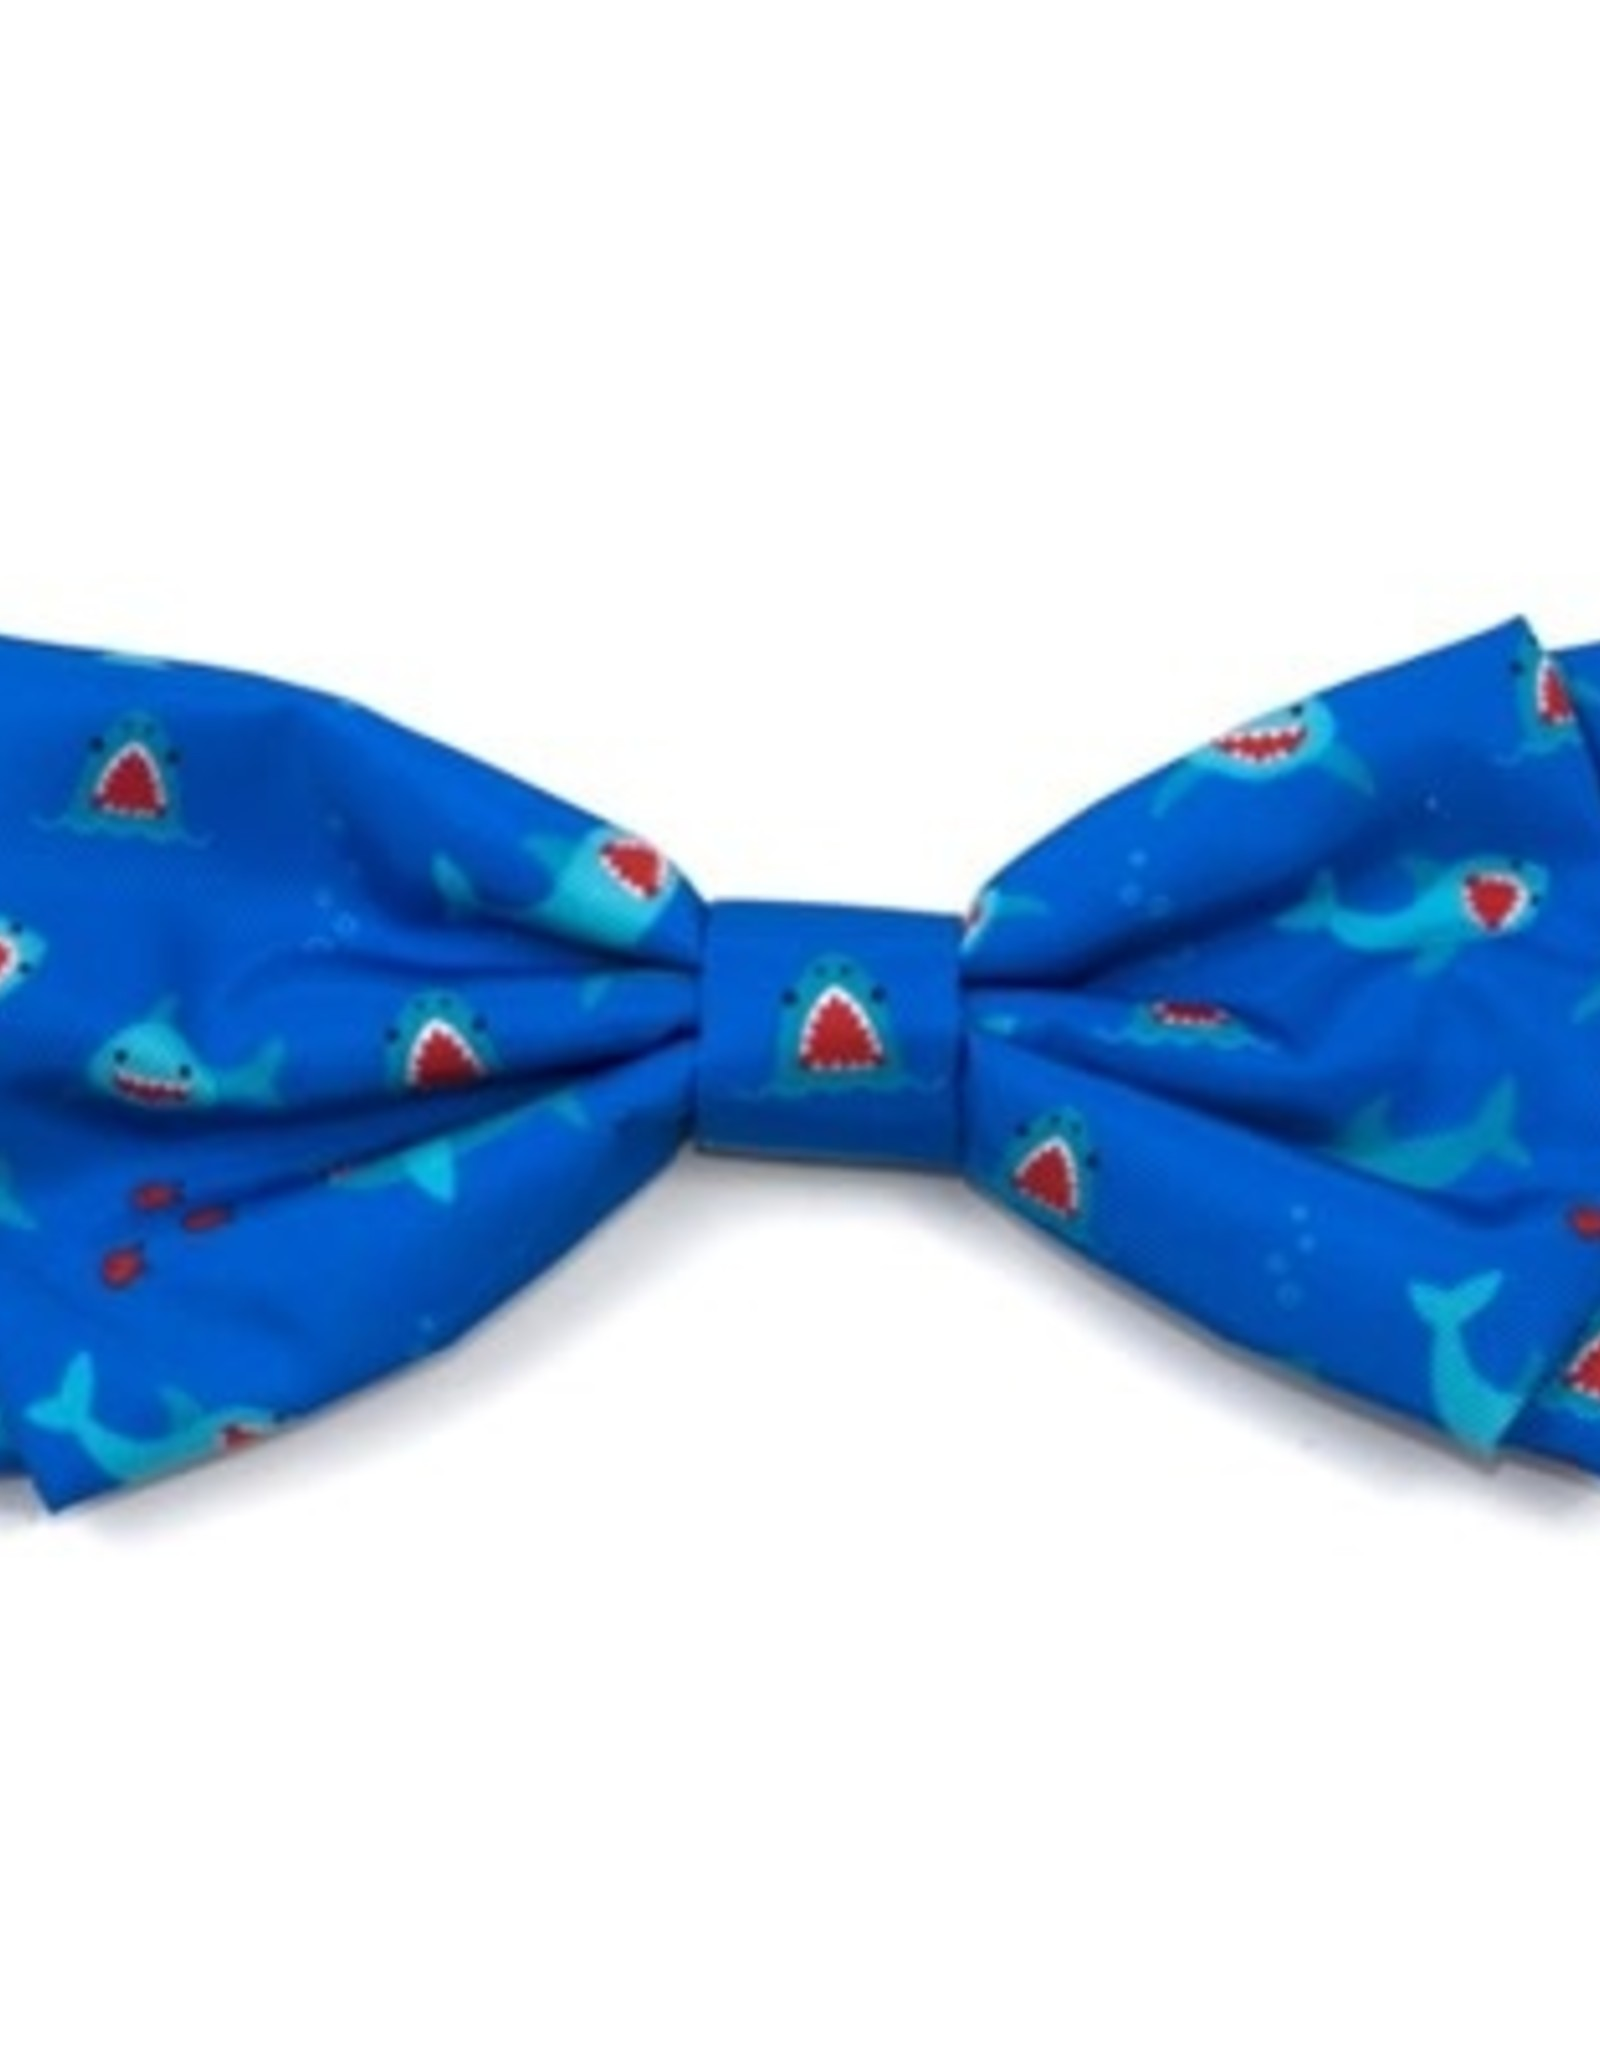 The Worthy Dog Chomp Bow Tie